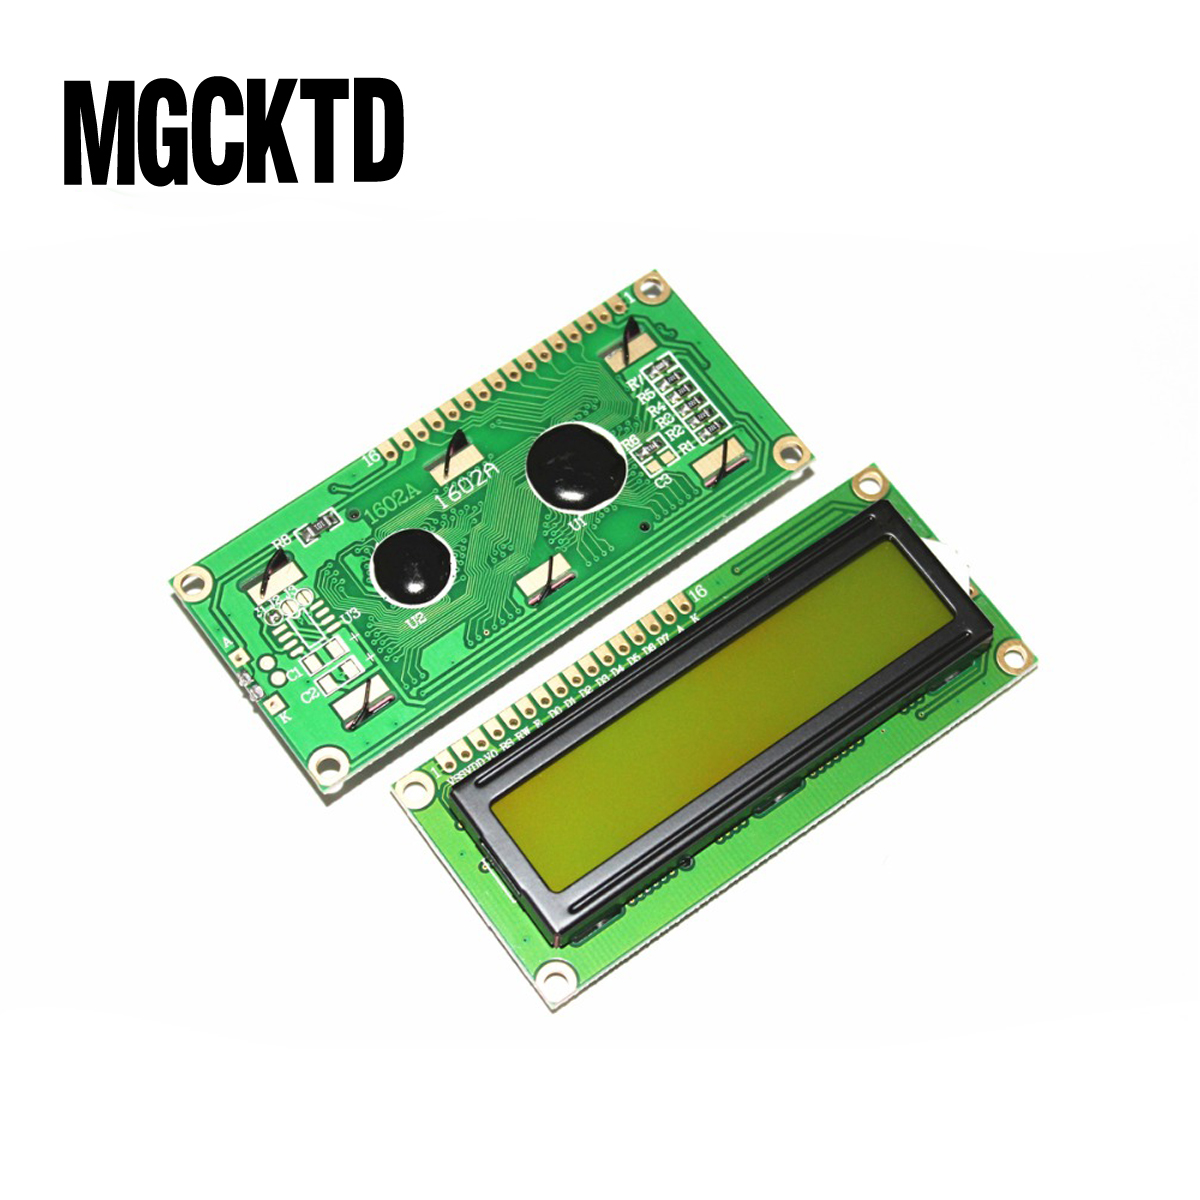 10PCS LCD1602 Module Green Screen 16x2 Character LCD Display Module.green Screen And White Code